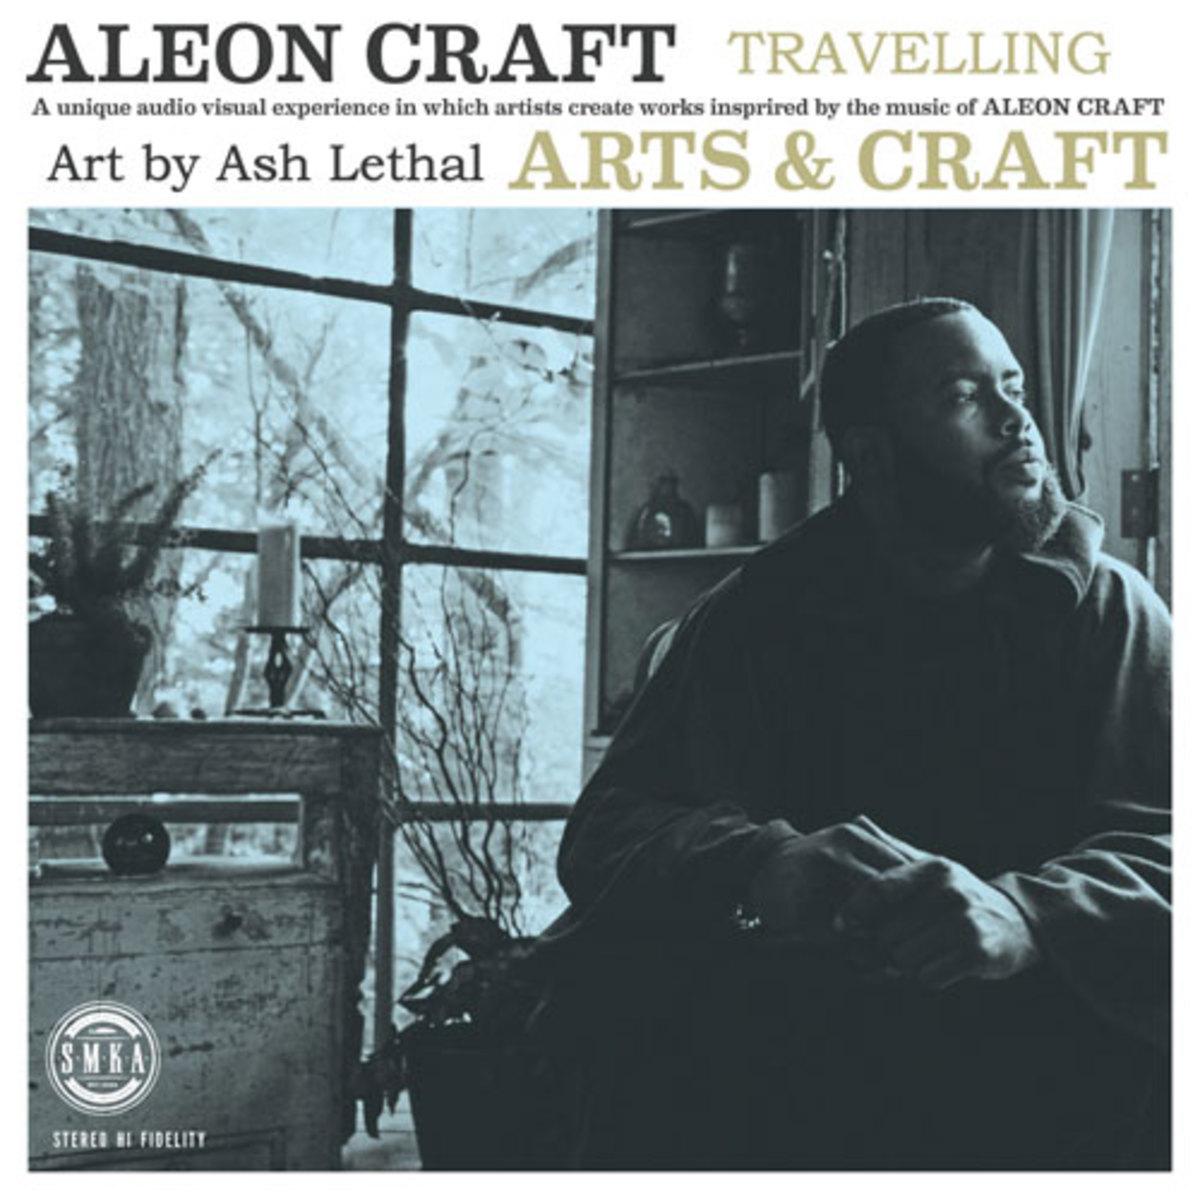 aleoncraft-travelling.jpg